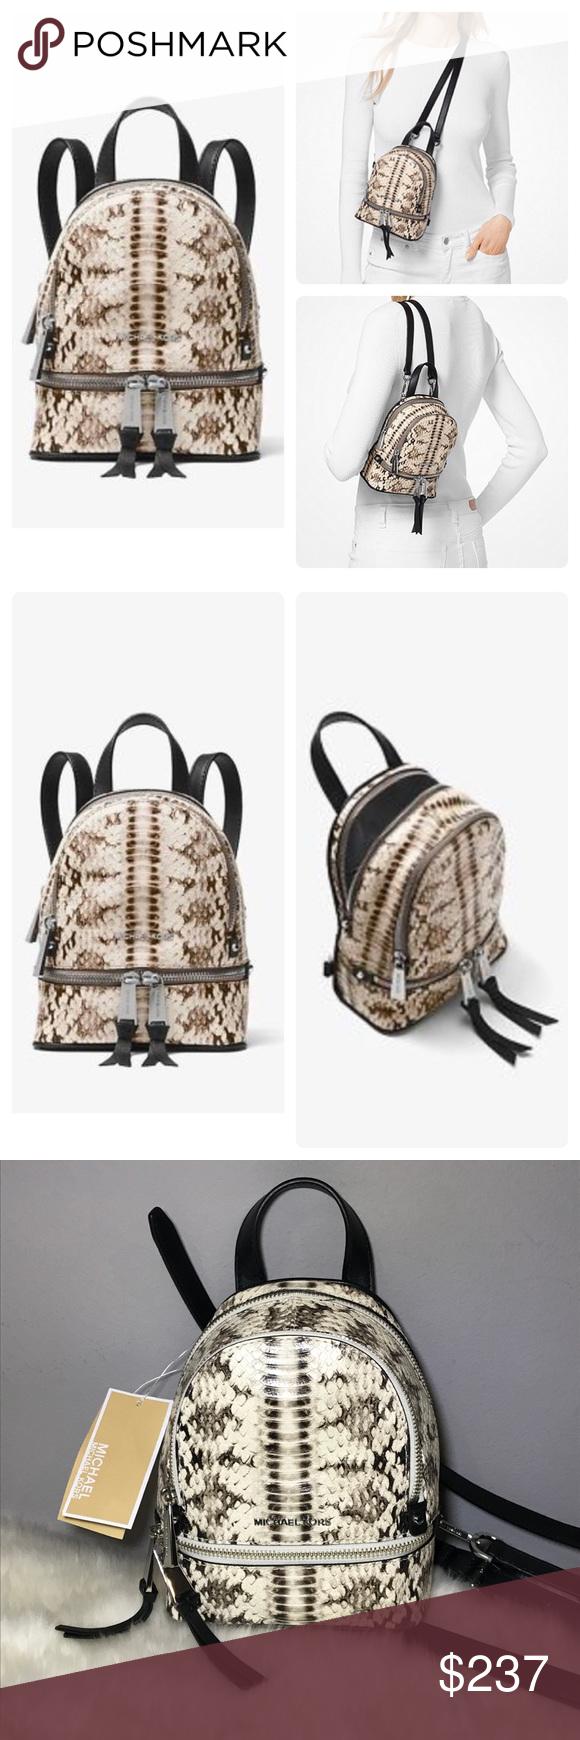 c6d8d2fe95f5 🔥NWT Michael Kors Rhea Snake-Embossed Backpack XS 🔥NWT Michael Kors Rhea  Mini